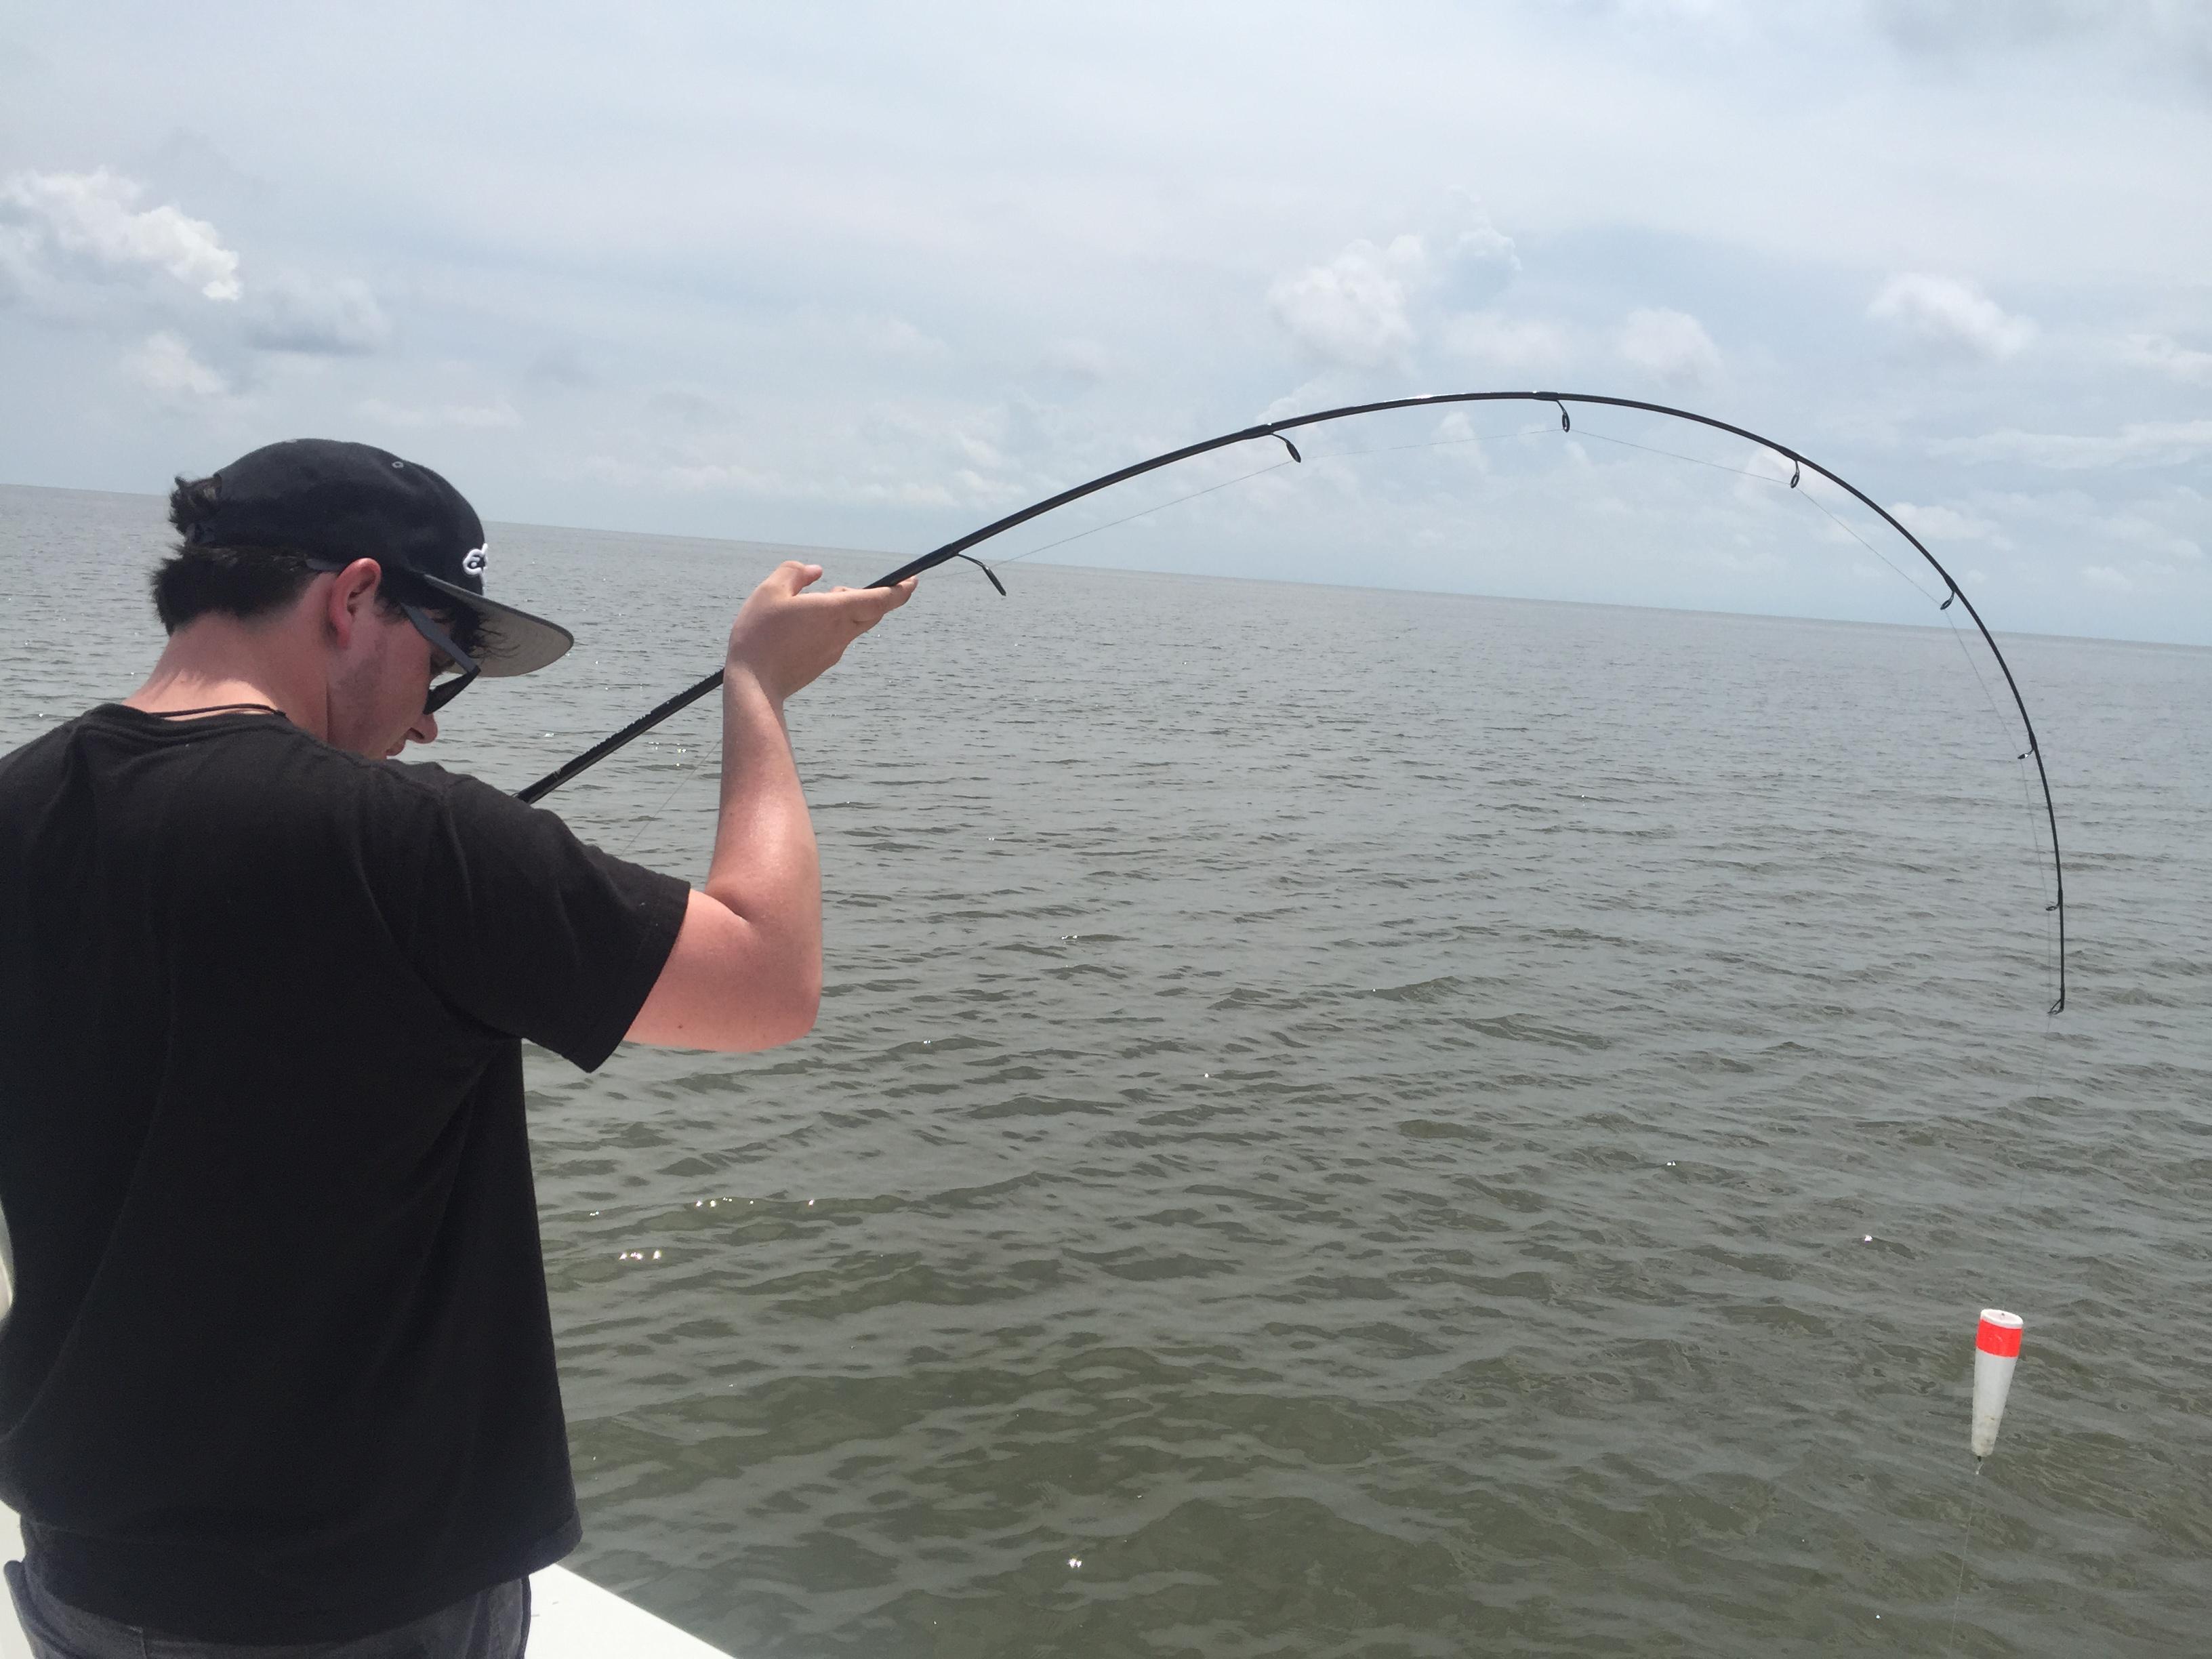 hooked up fishing